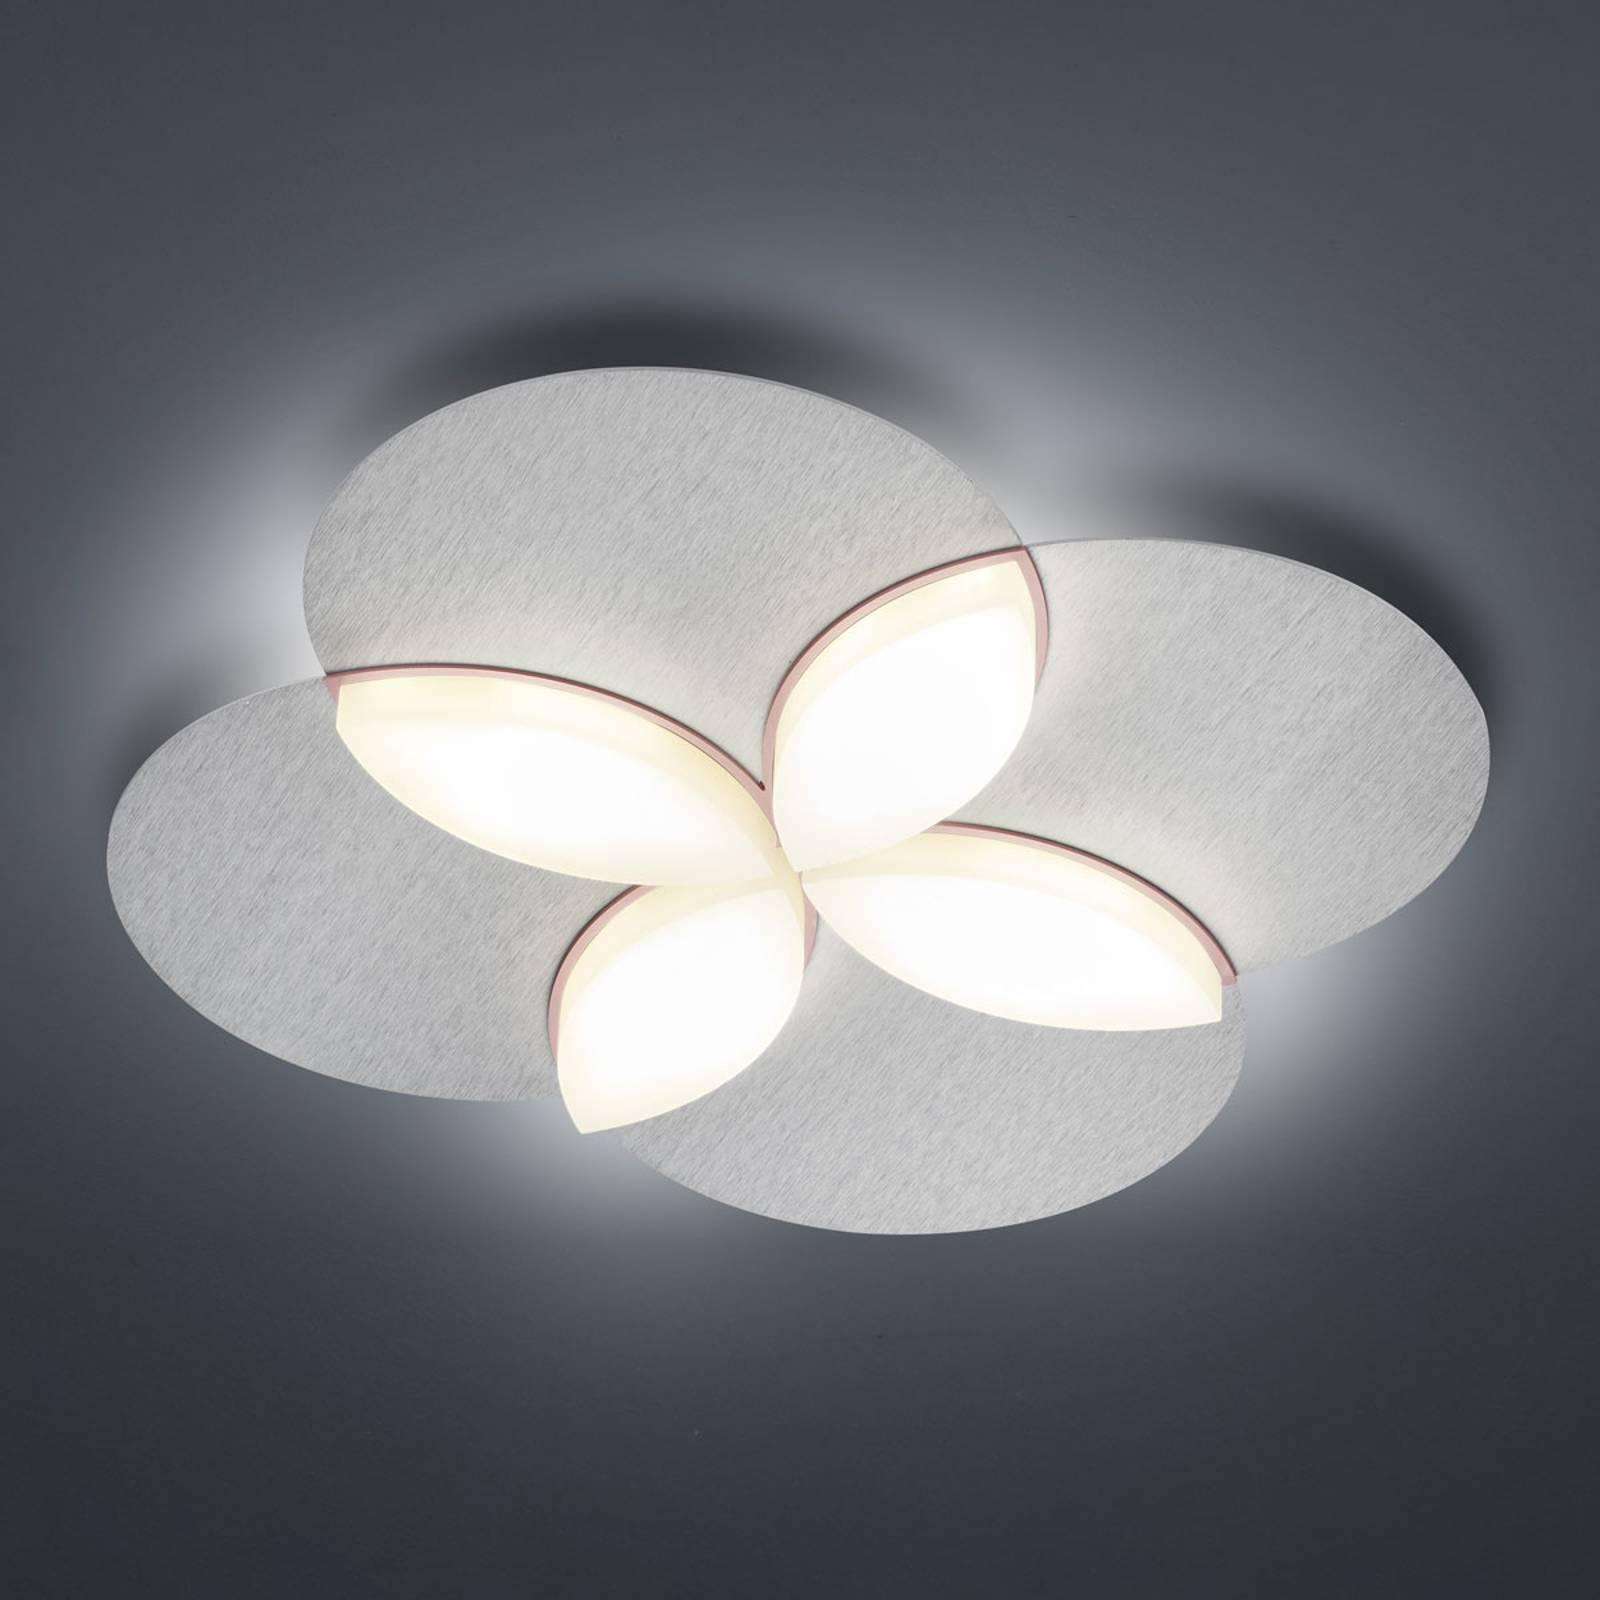 BANKAMP Spring LED plafondlamp, zilver geanodis.